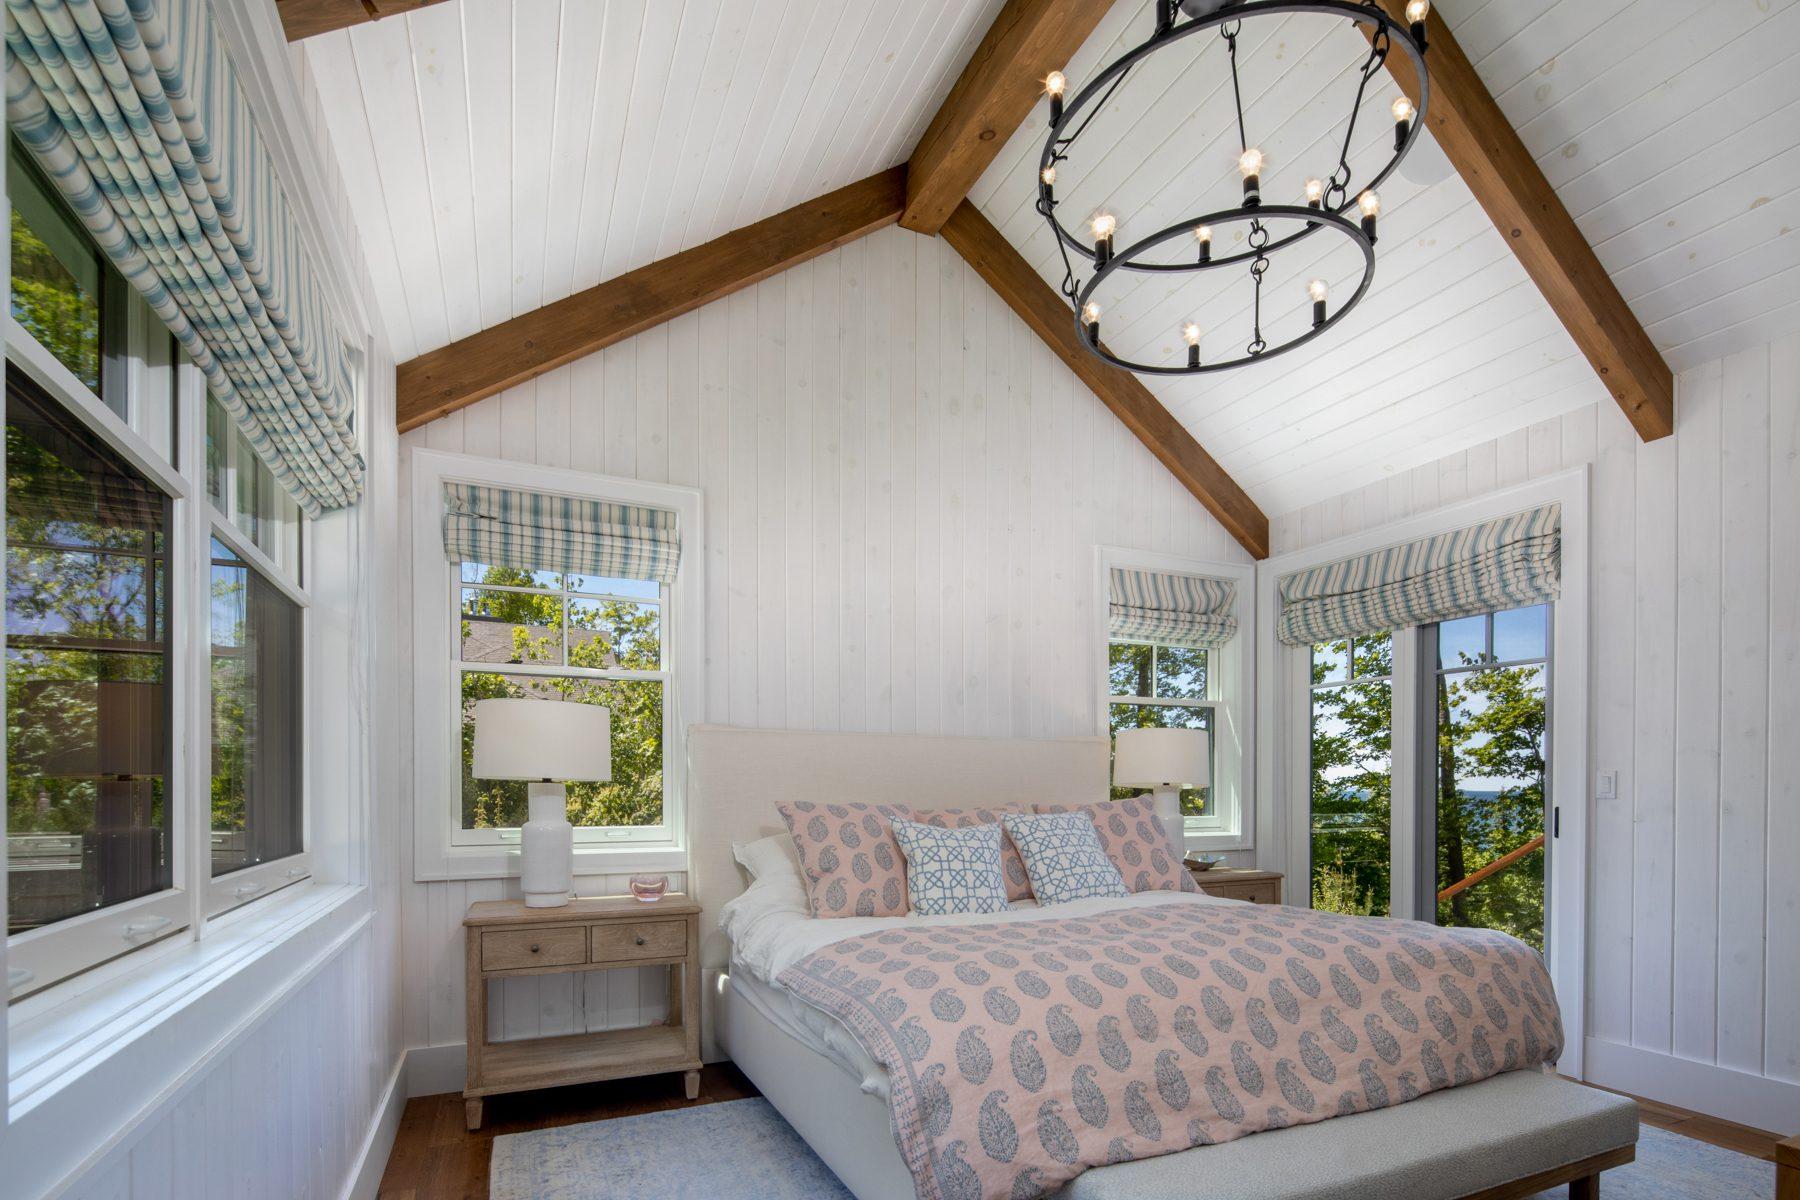 Normerica-Timber-Homes-Timber-Frame-Portfolio-Beachside-Bliss-Interior-Master-Bedroom